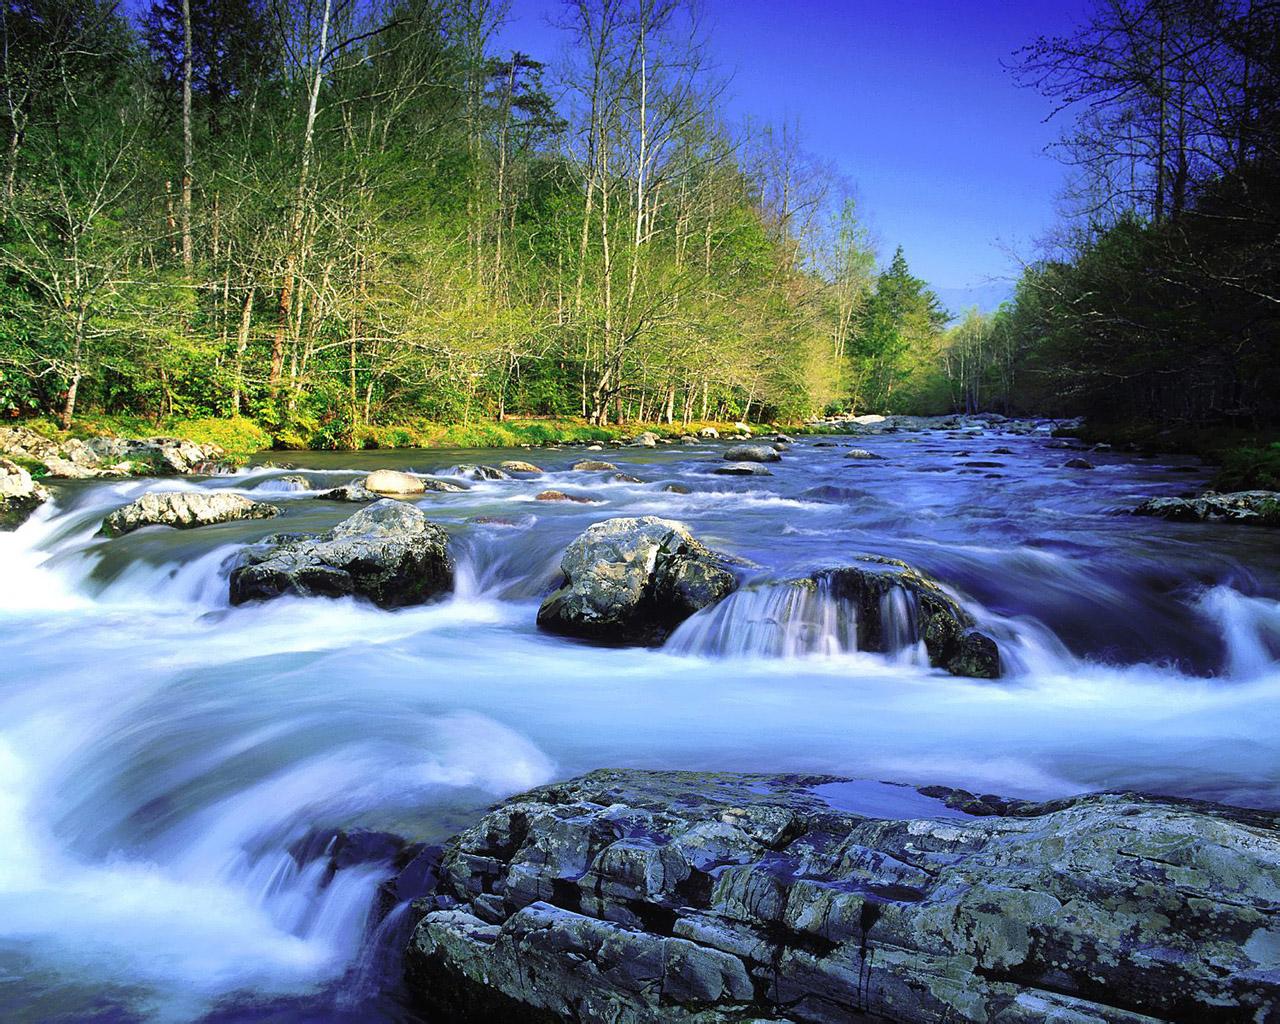 1280x1024 Nature Wallpapers,Beautifull Natural Wallpapers